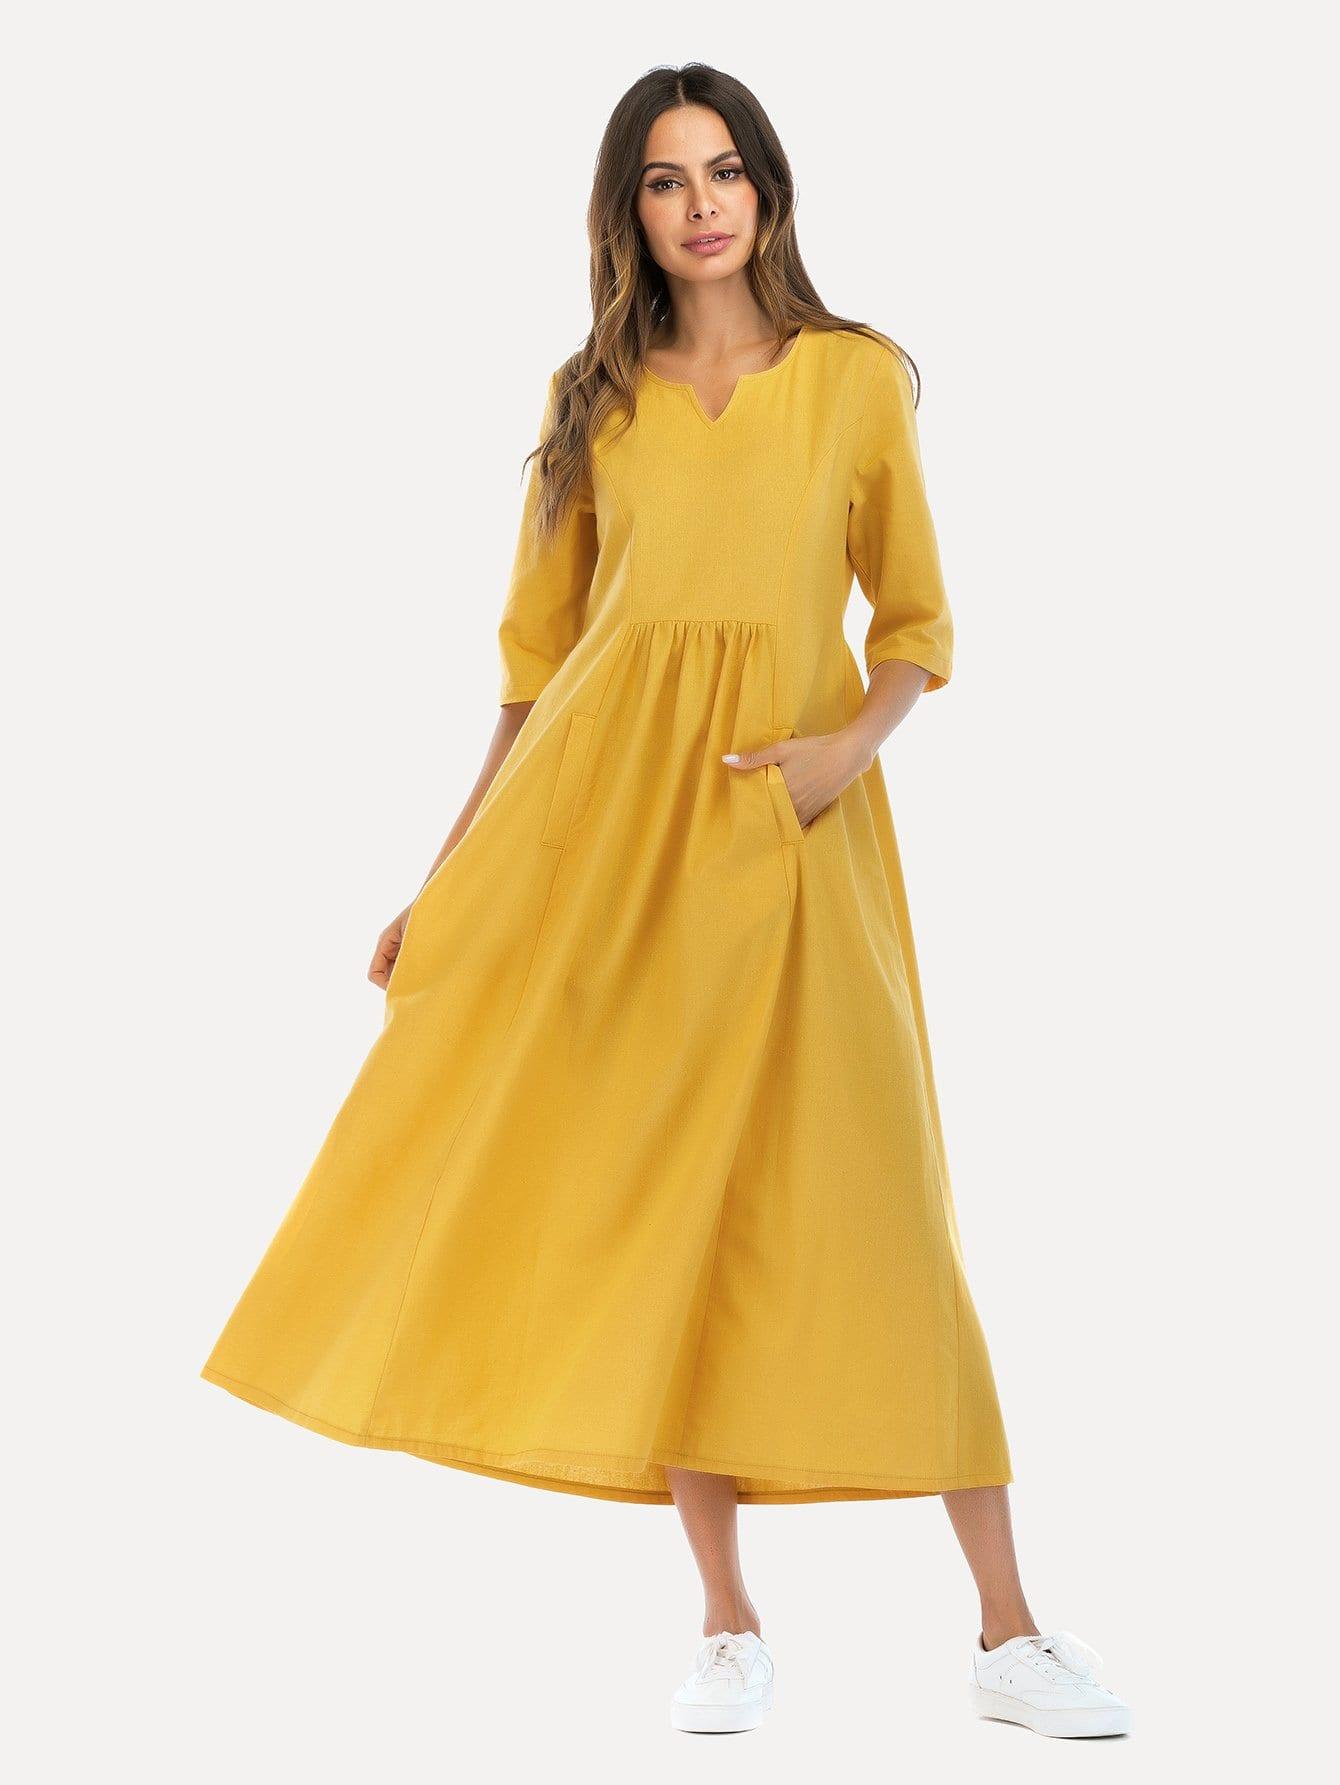 Hidden Pocket Flare Dress hidden pocket striped dress